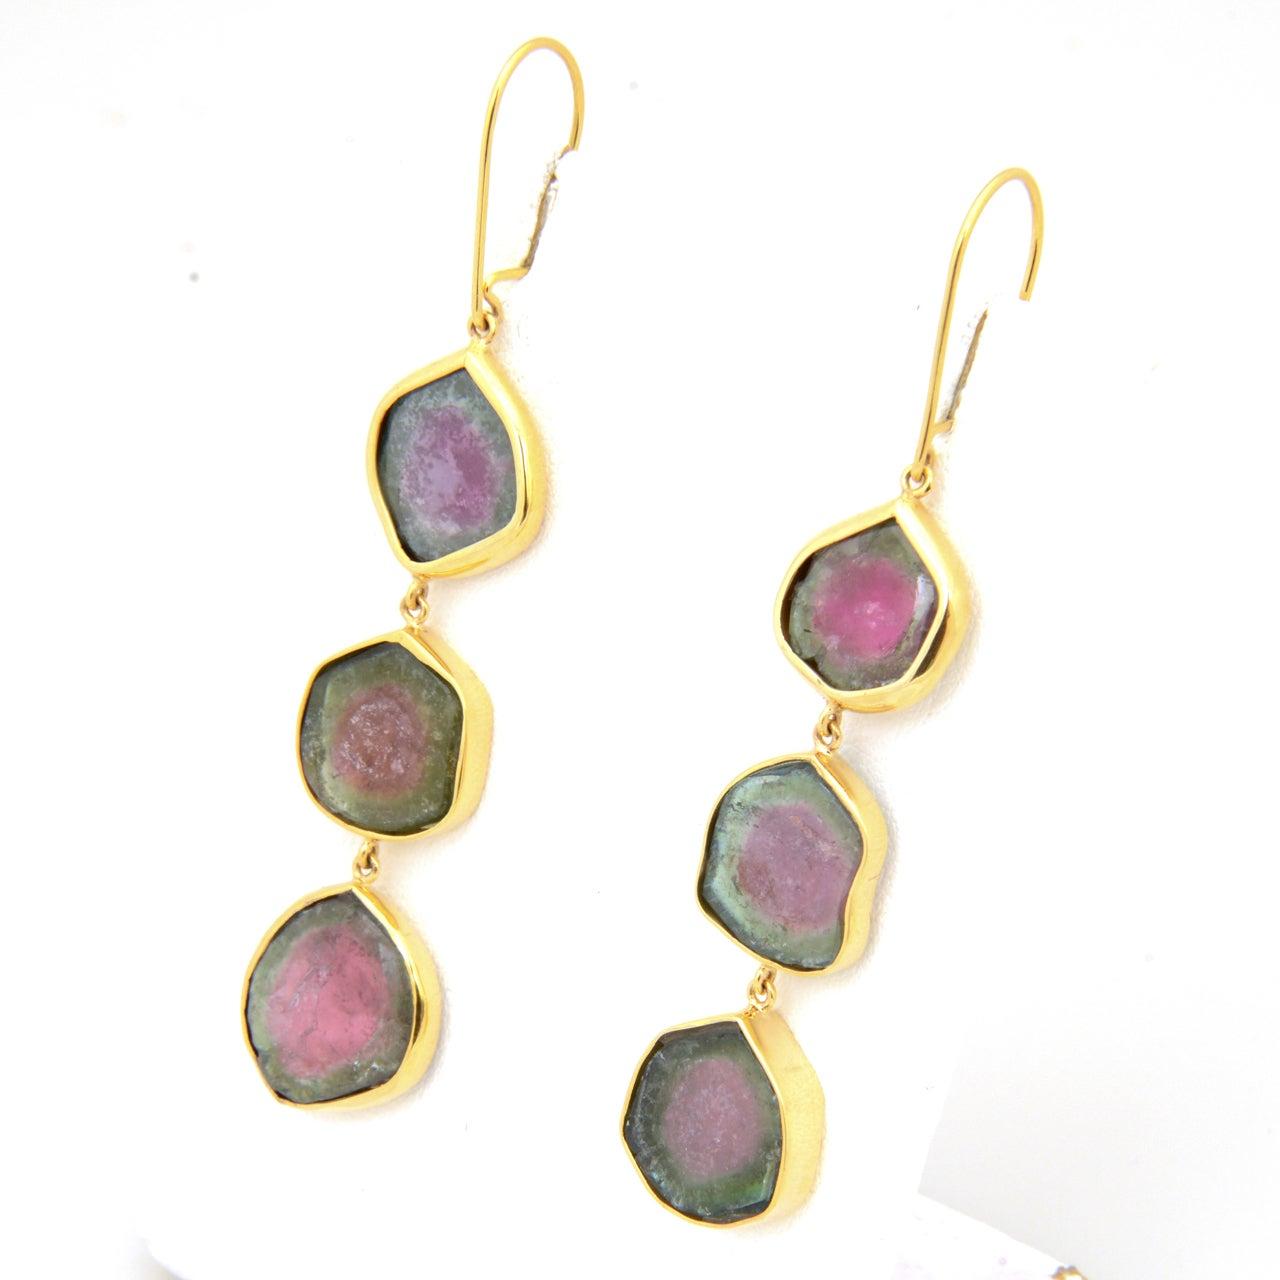 watermelon tourmaline gold earrings image 3